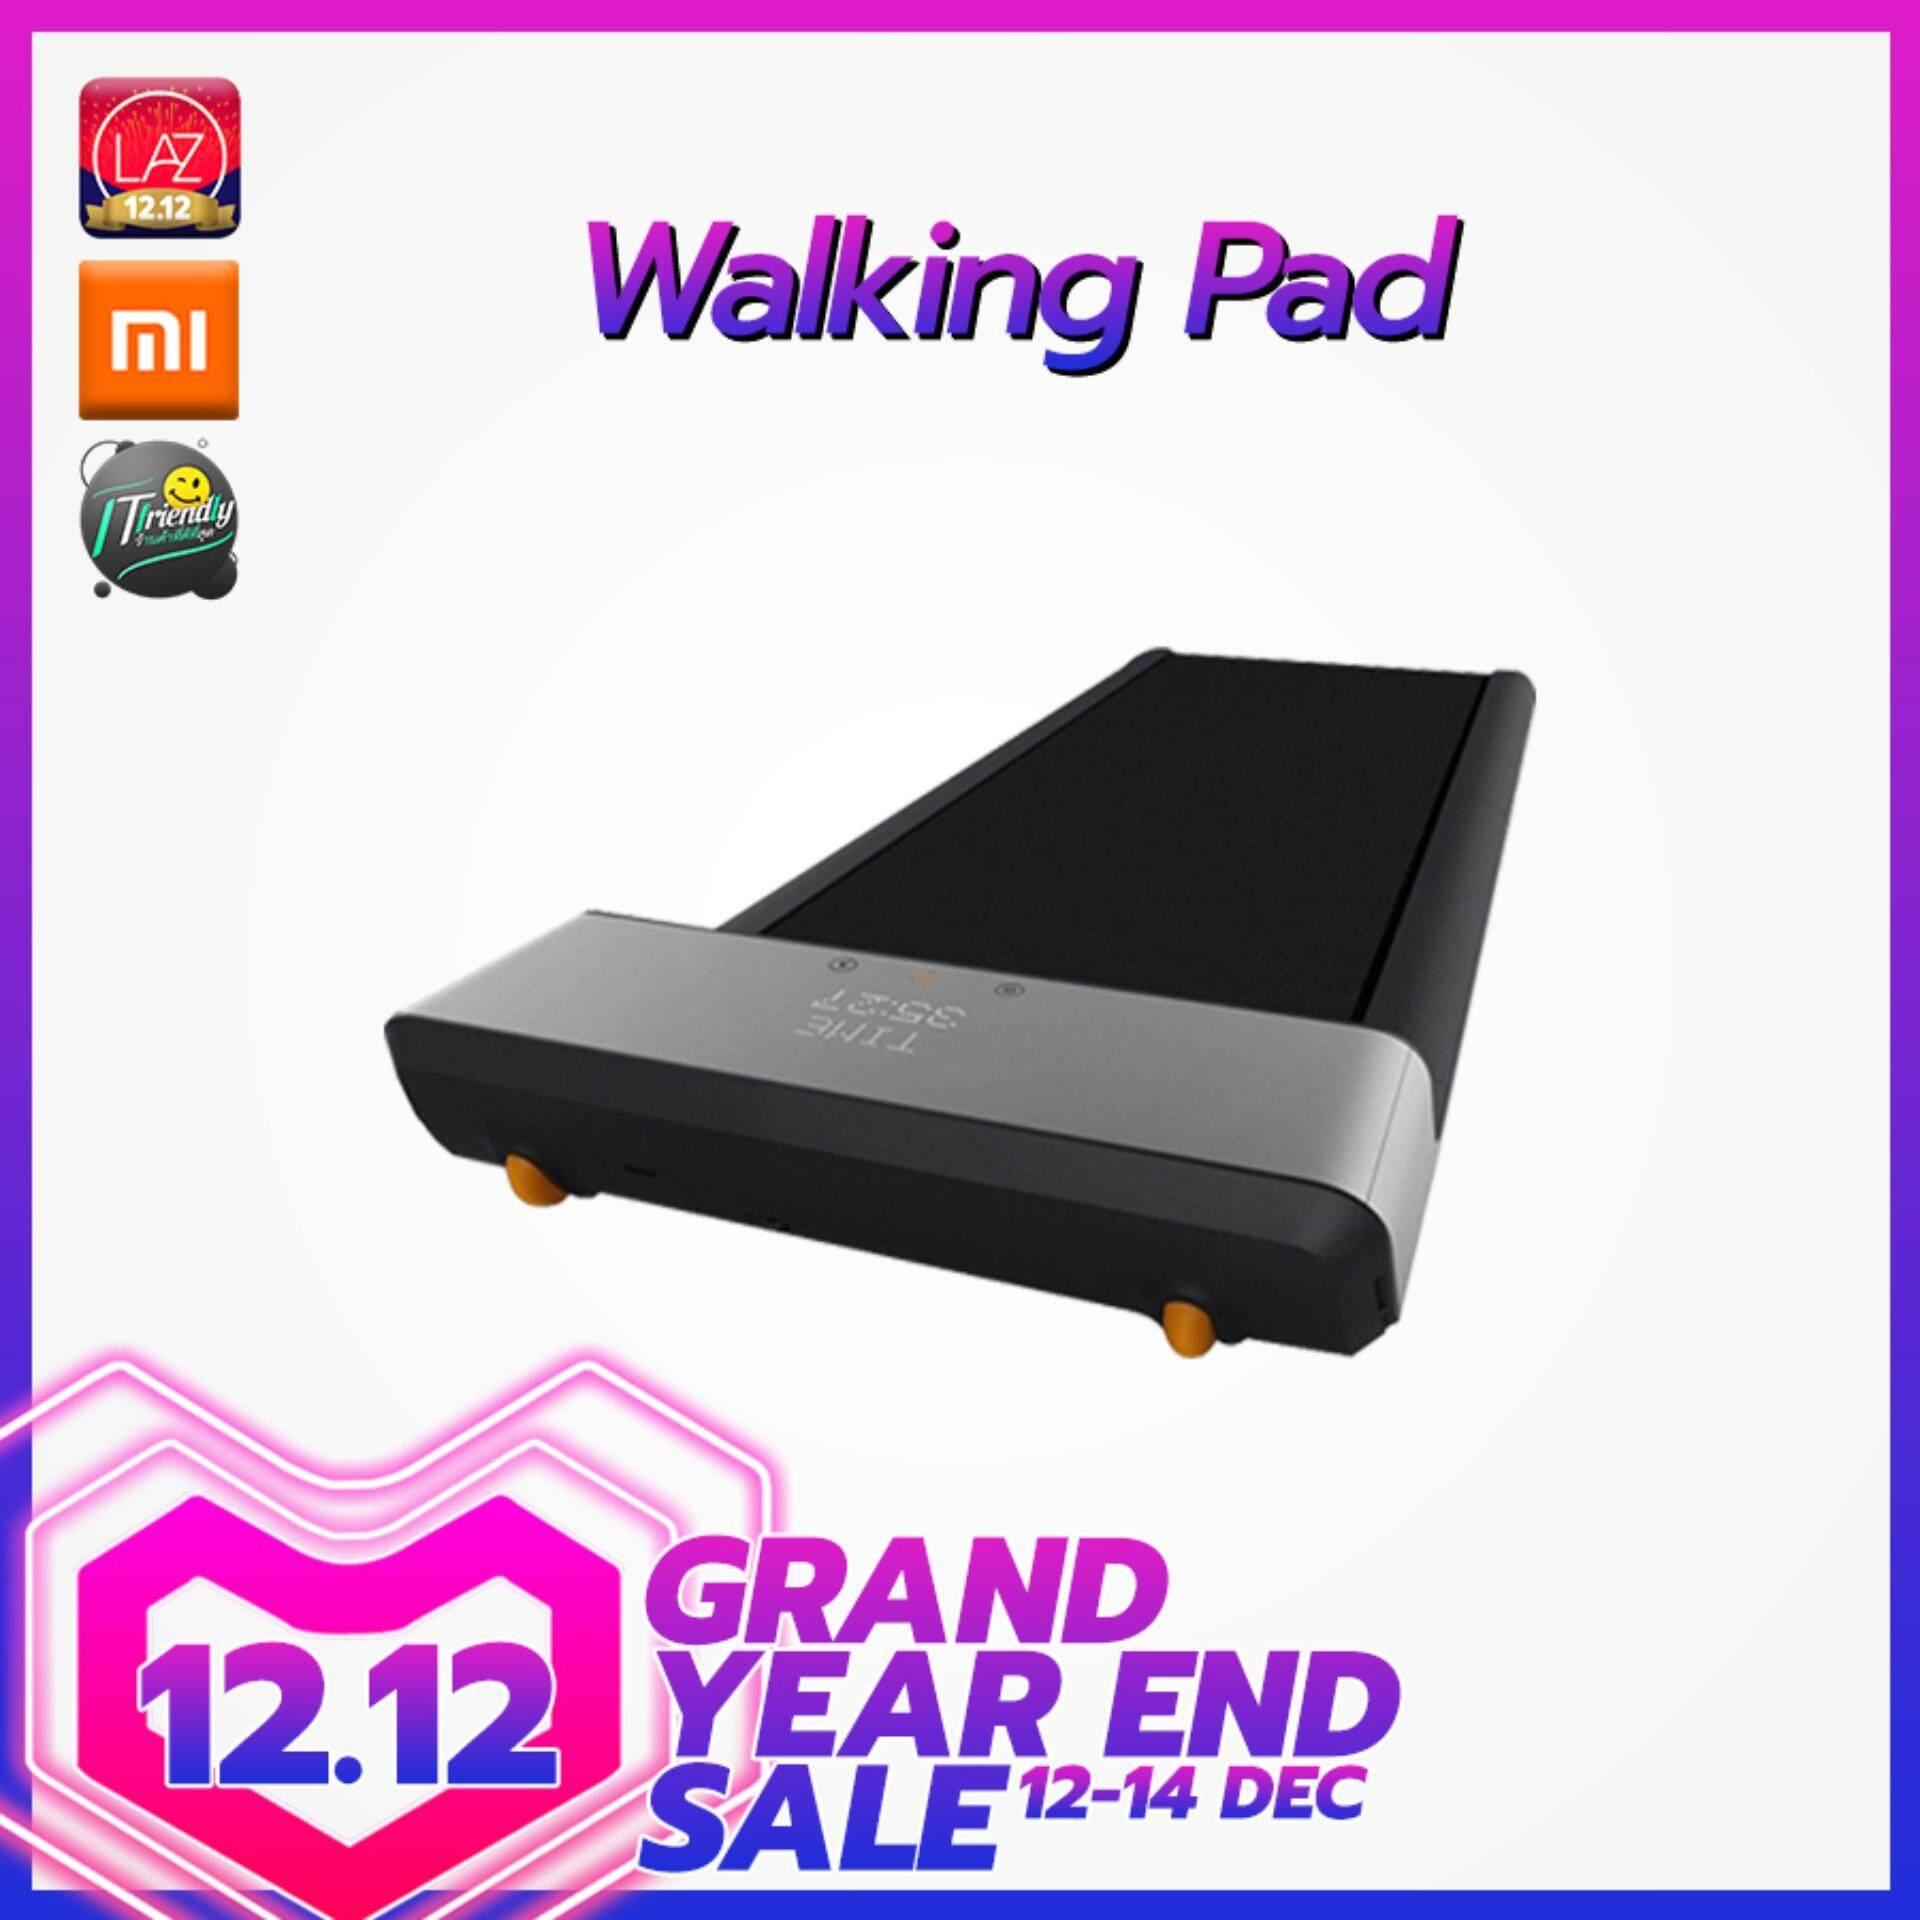 Xiaomi Walking Pad Smart Treadmill - ลู่เดินไฟฟ้า ควบคุมด้วยรีโมท พับเก็บได้ ประหยัดพื้นที่ (รับประกัน 1 เดือน )